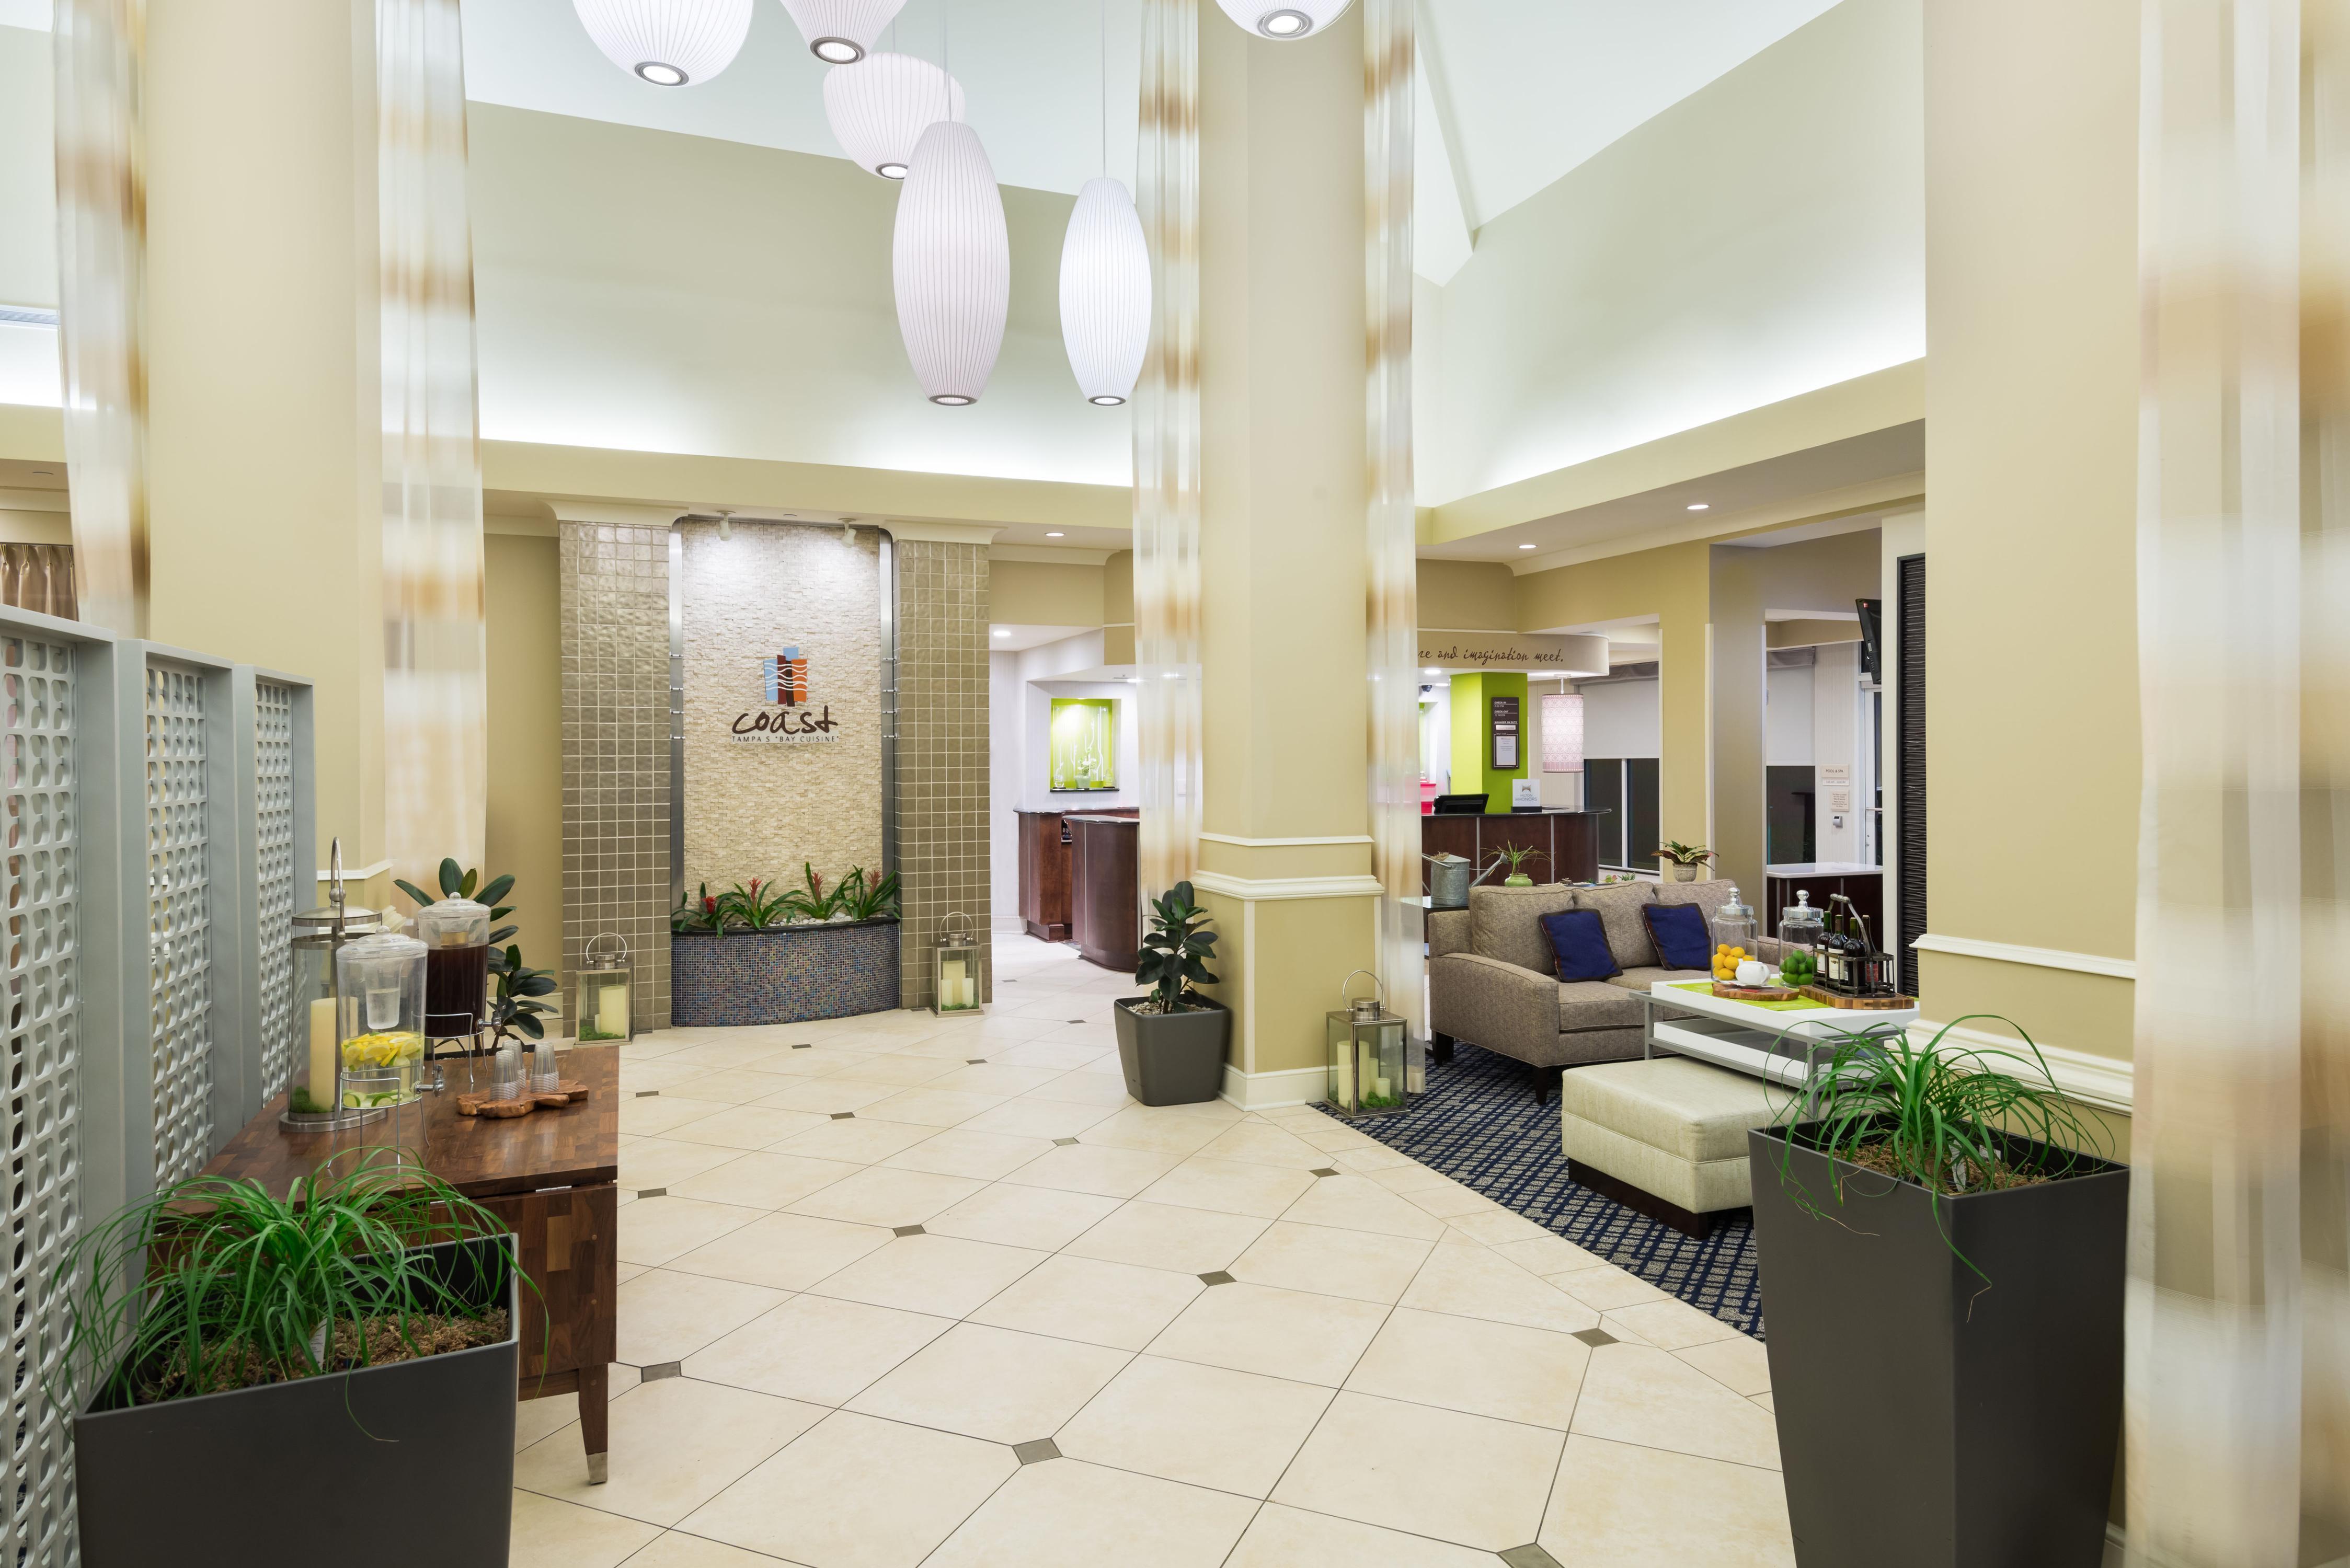 Hilton garden inn tampa airport westshore coupons near me in tampa 8coupons for Hilton garden inn tampa airport